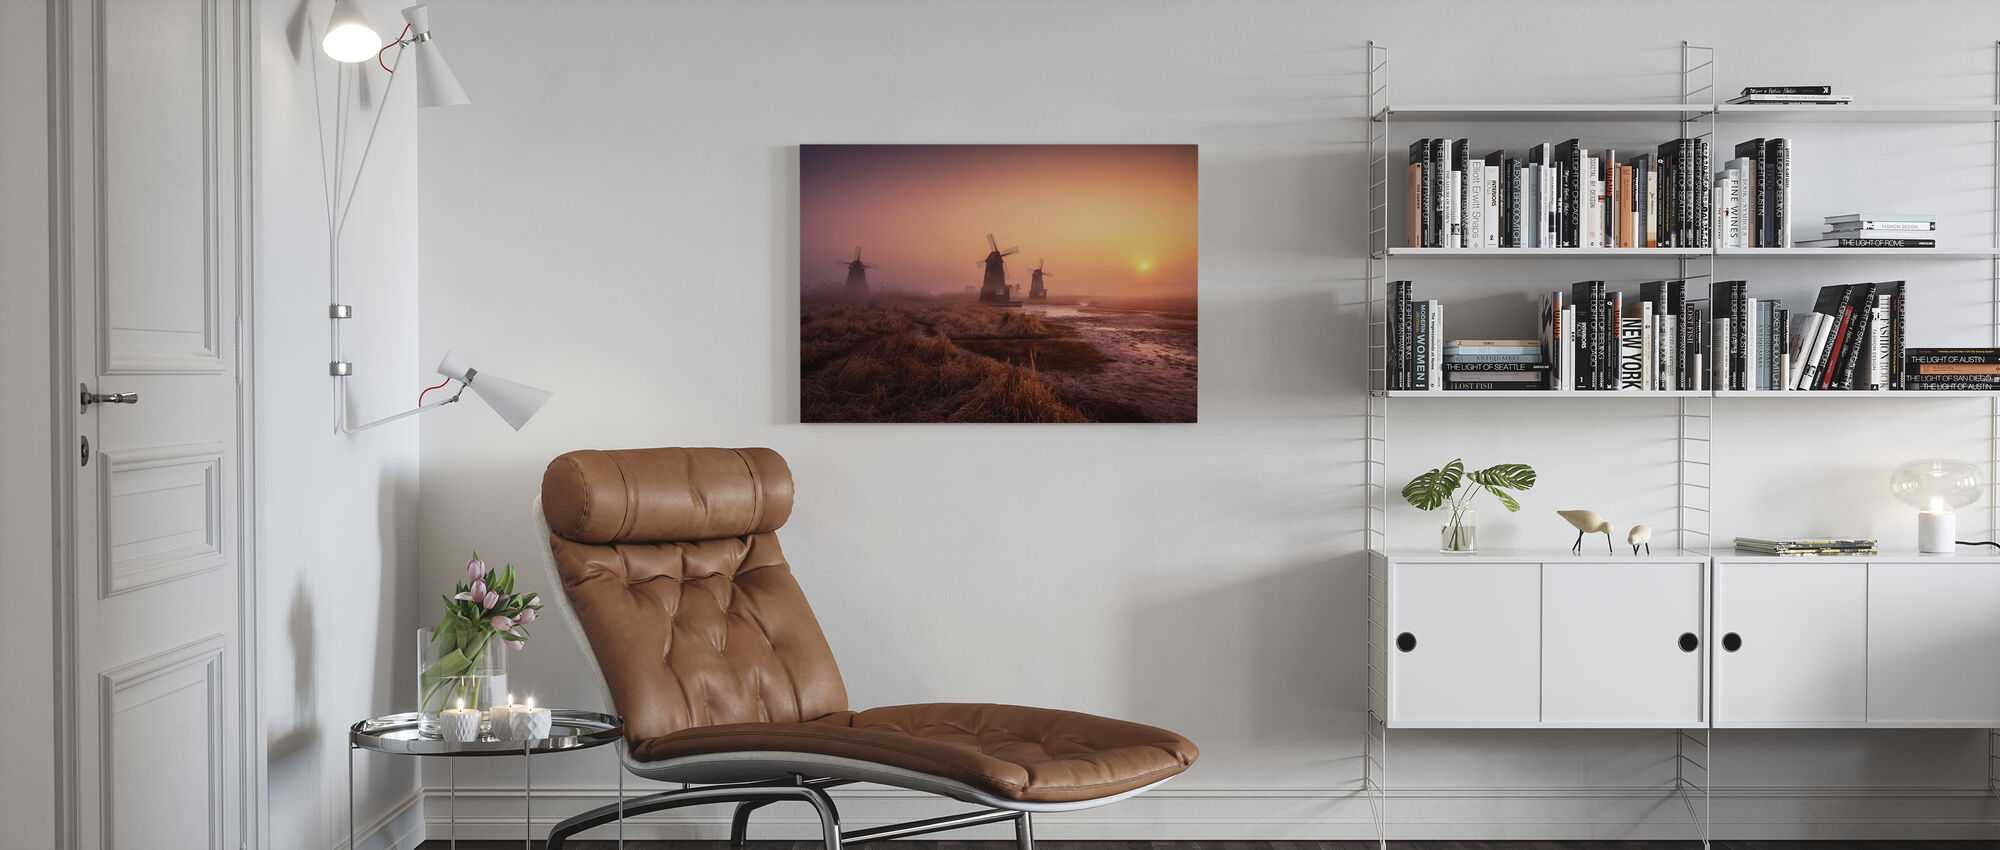 Mistige ochtend - Canvas print - Woonkamer